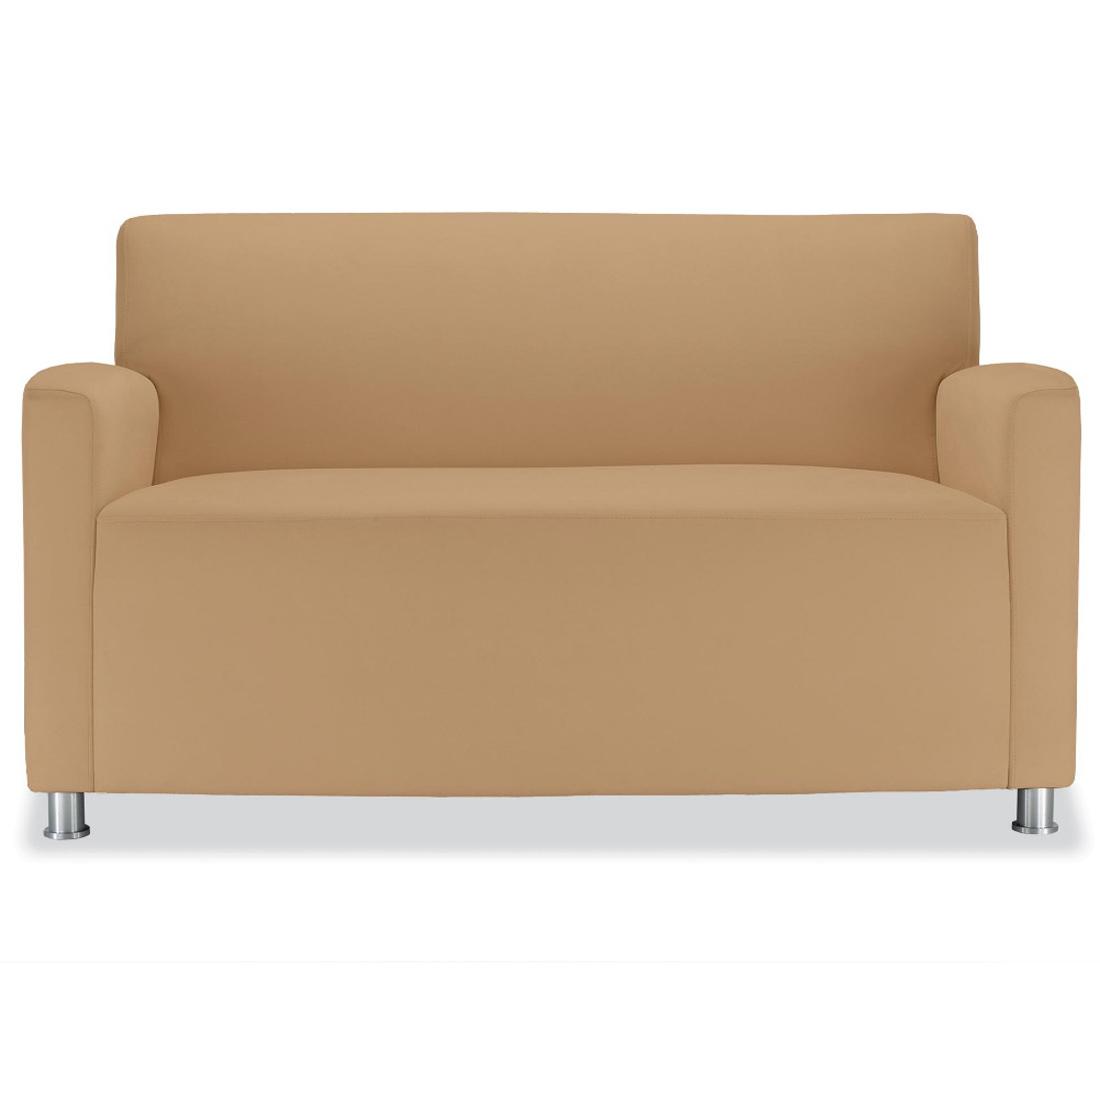 E1610 Sofa